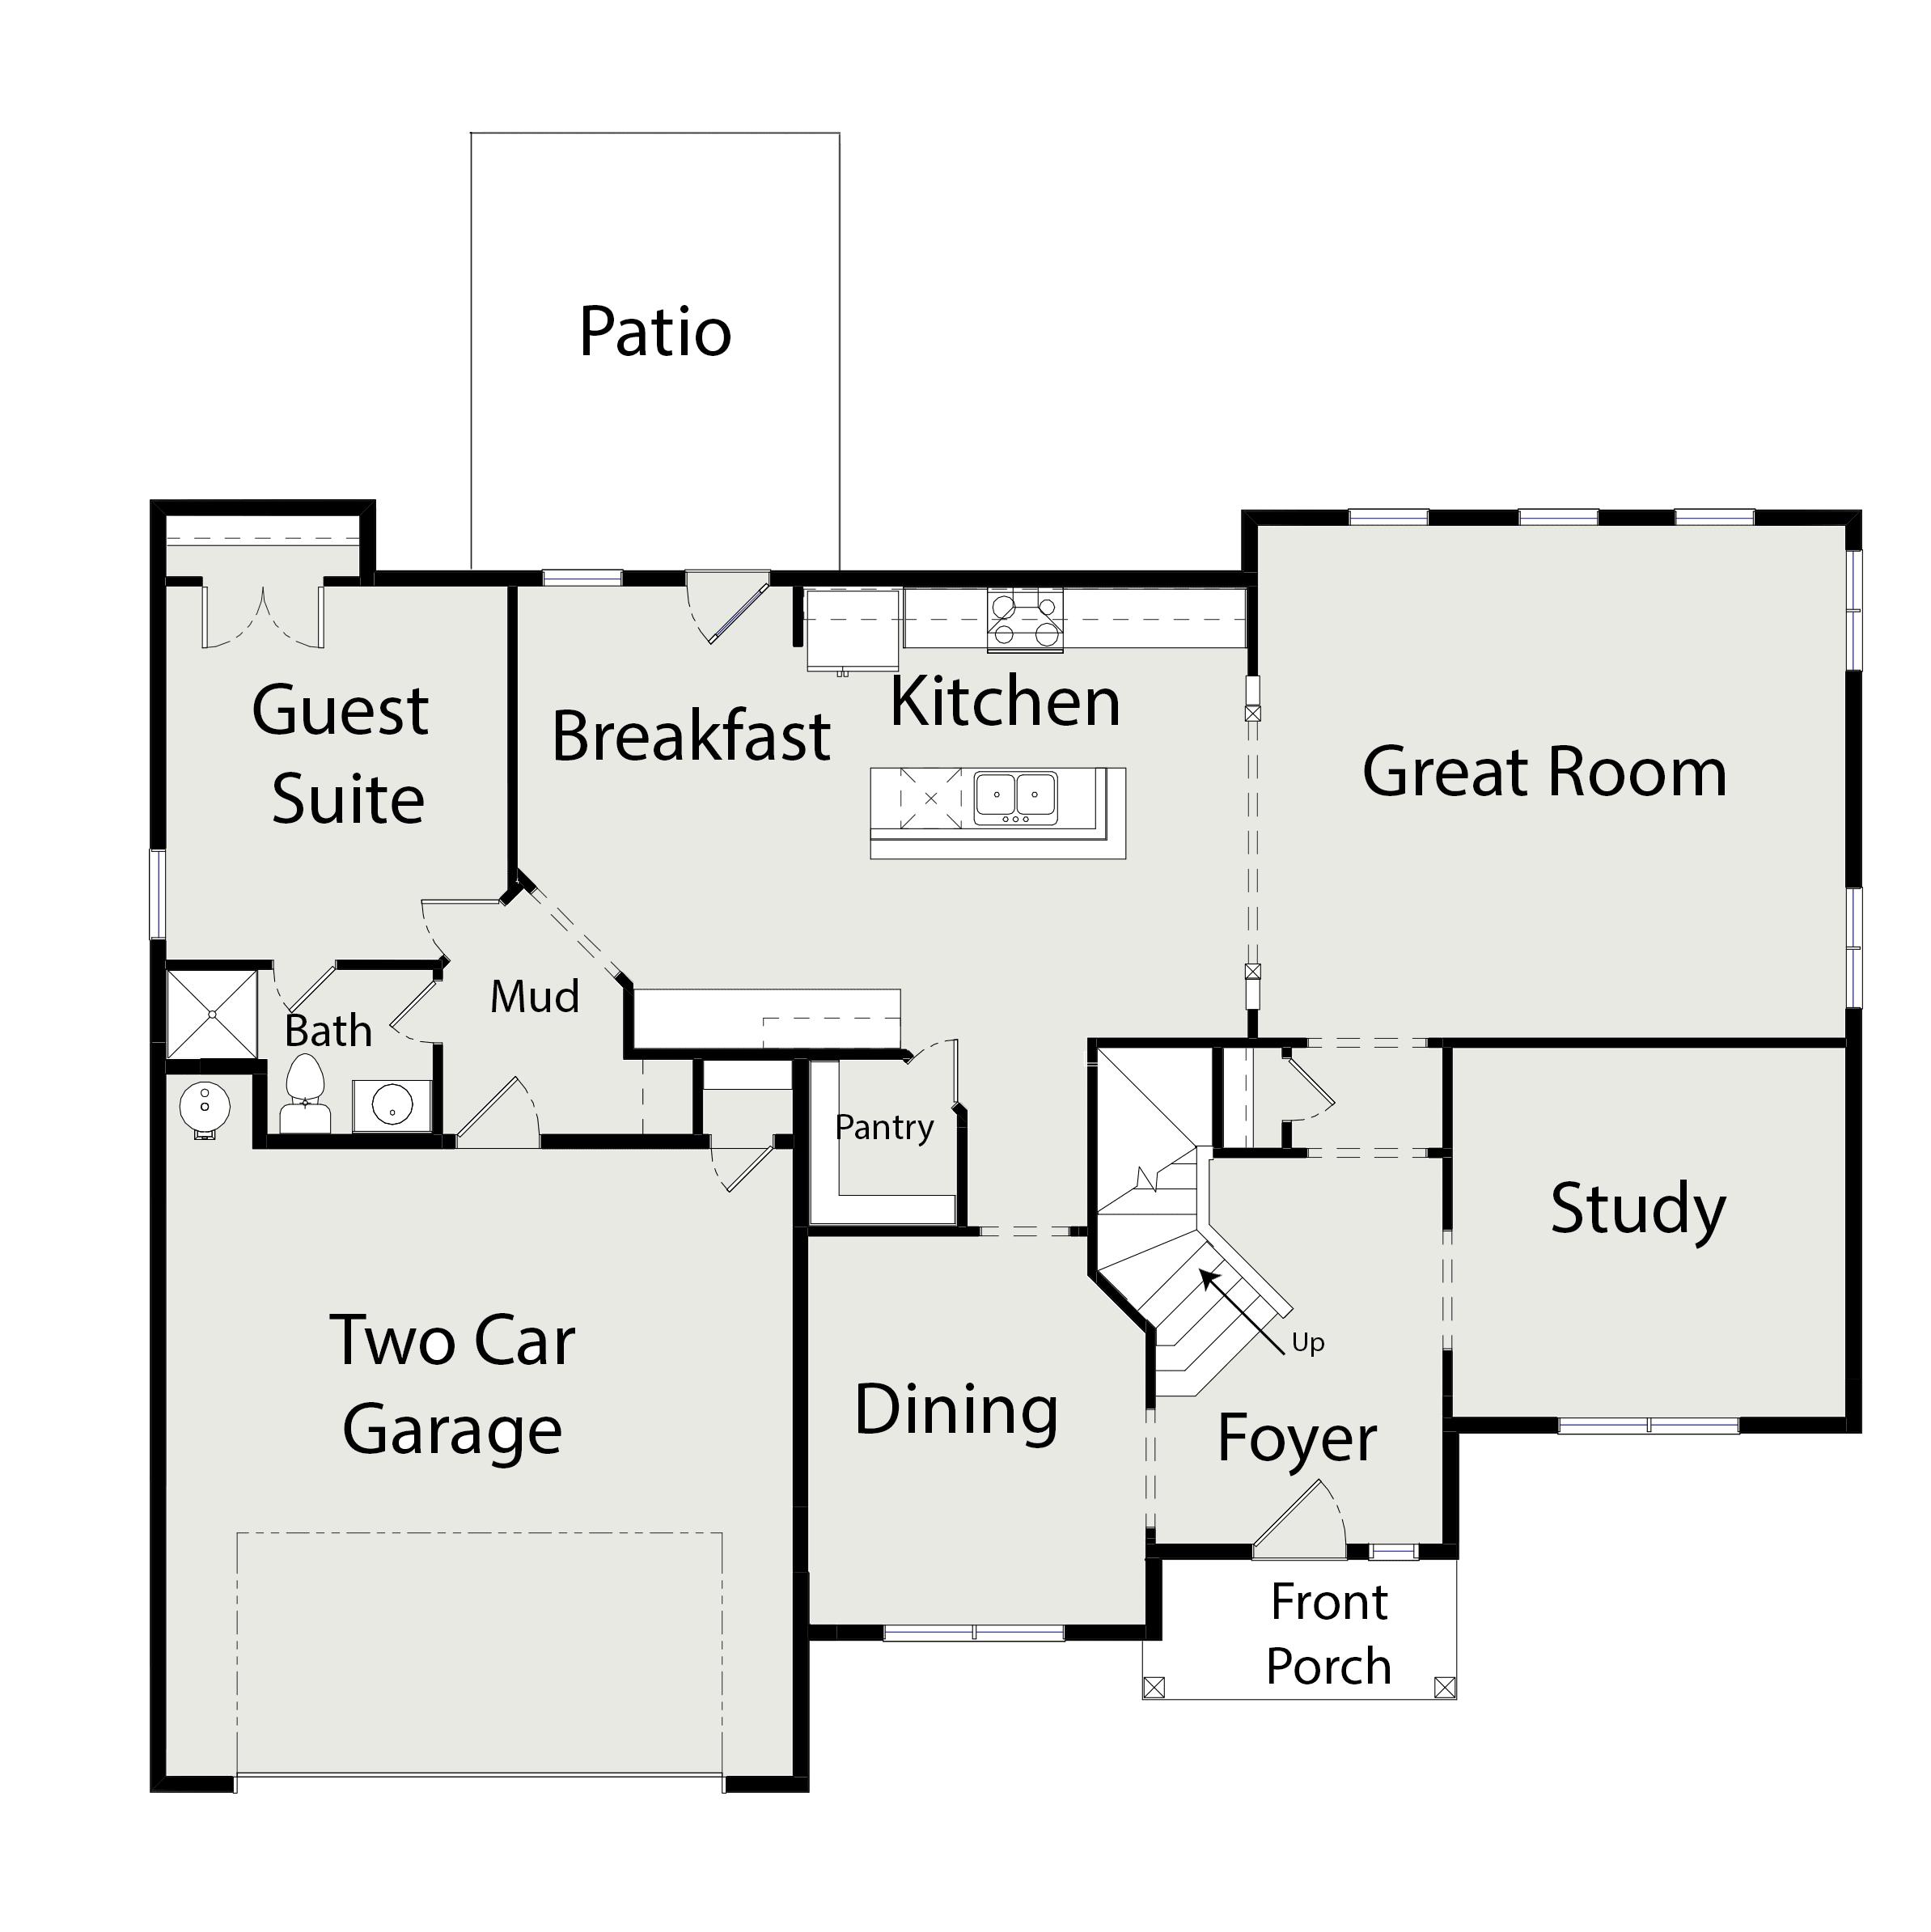 saussy burbank floor plan modern home design and saussy burbank floor plans hampton burbank home plans